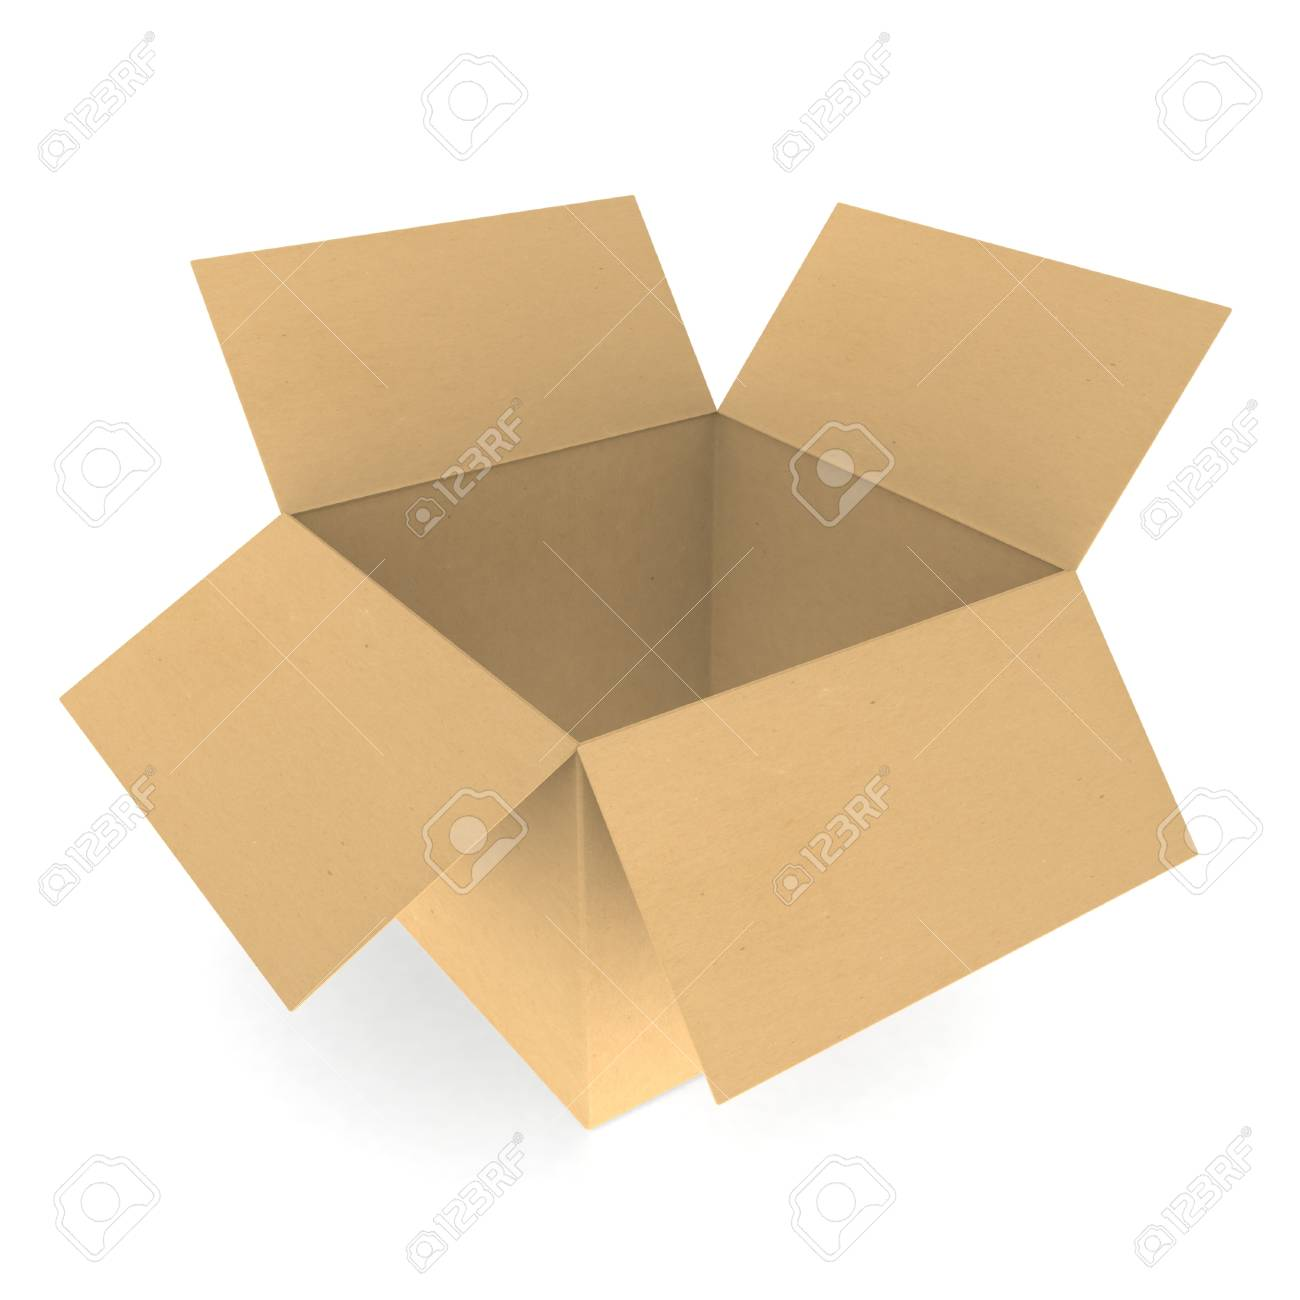 Open cardboard box Stock Photo - 9919333